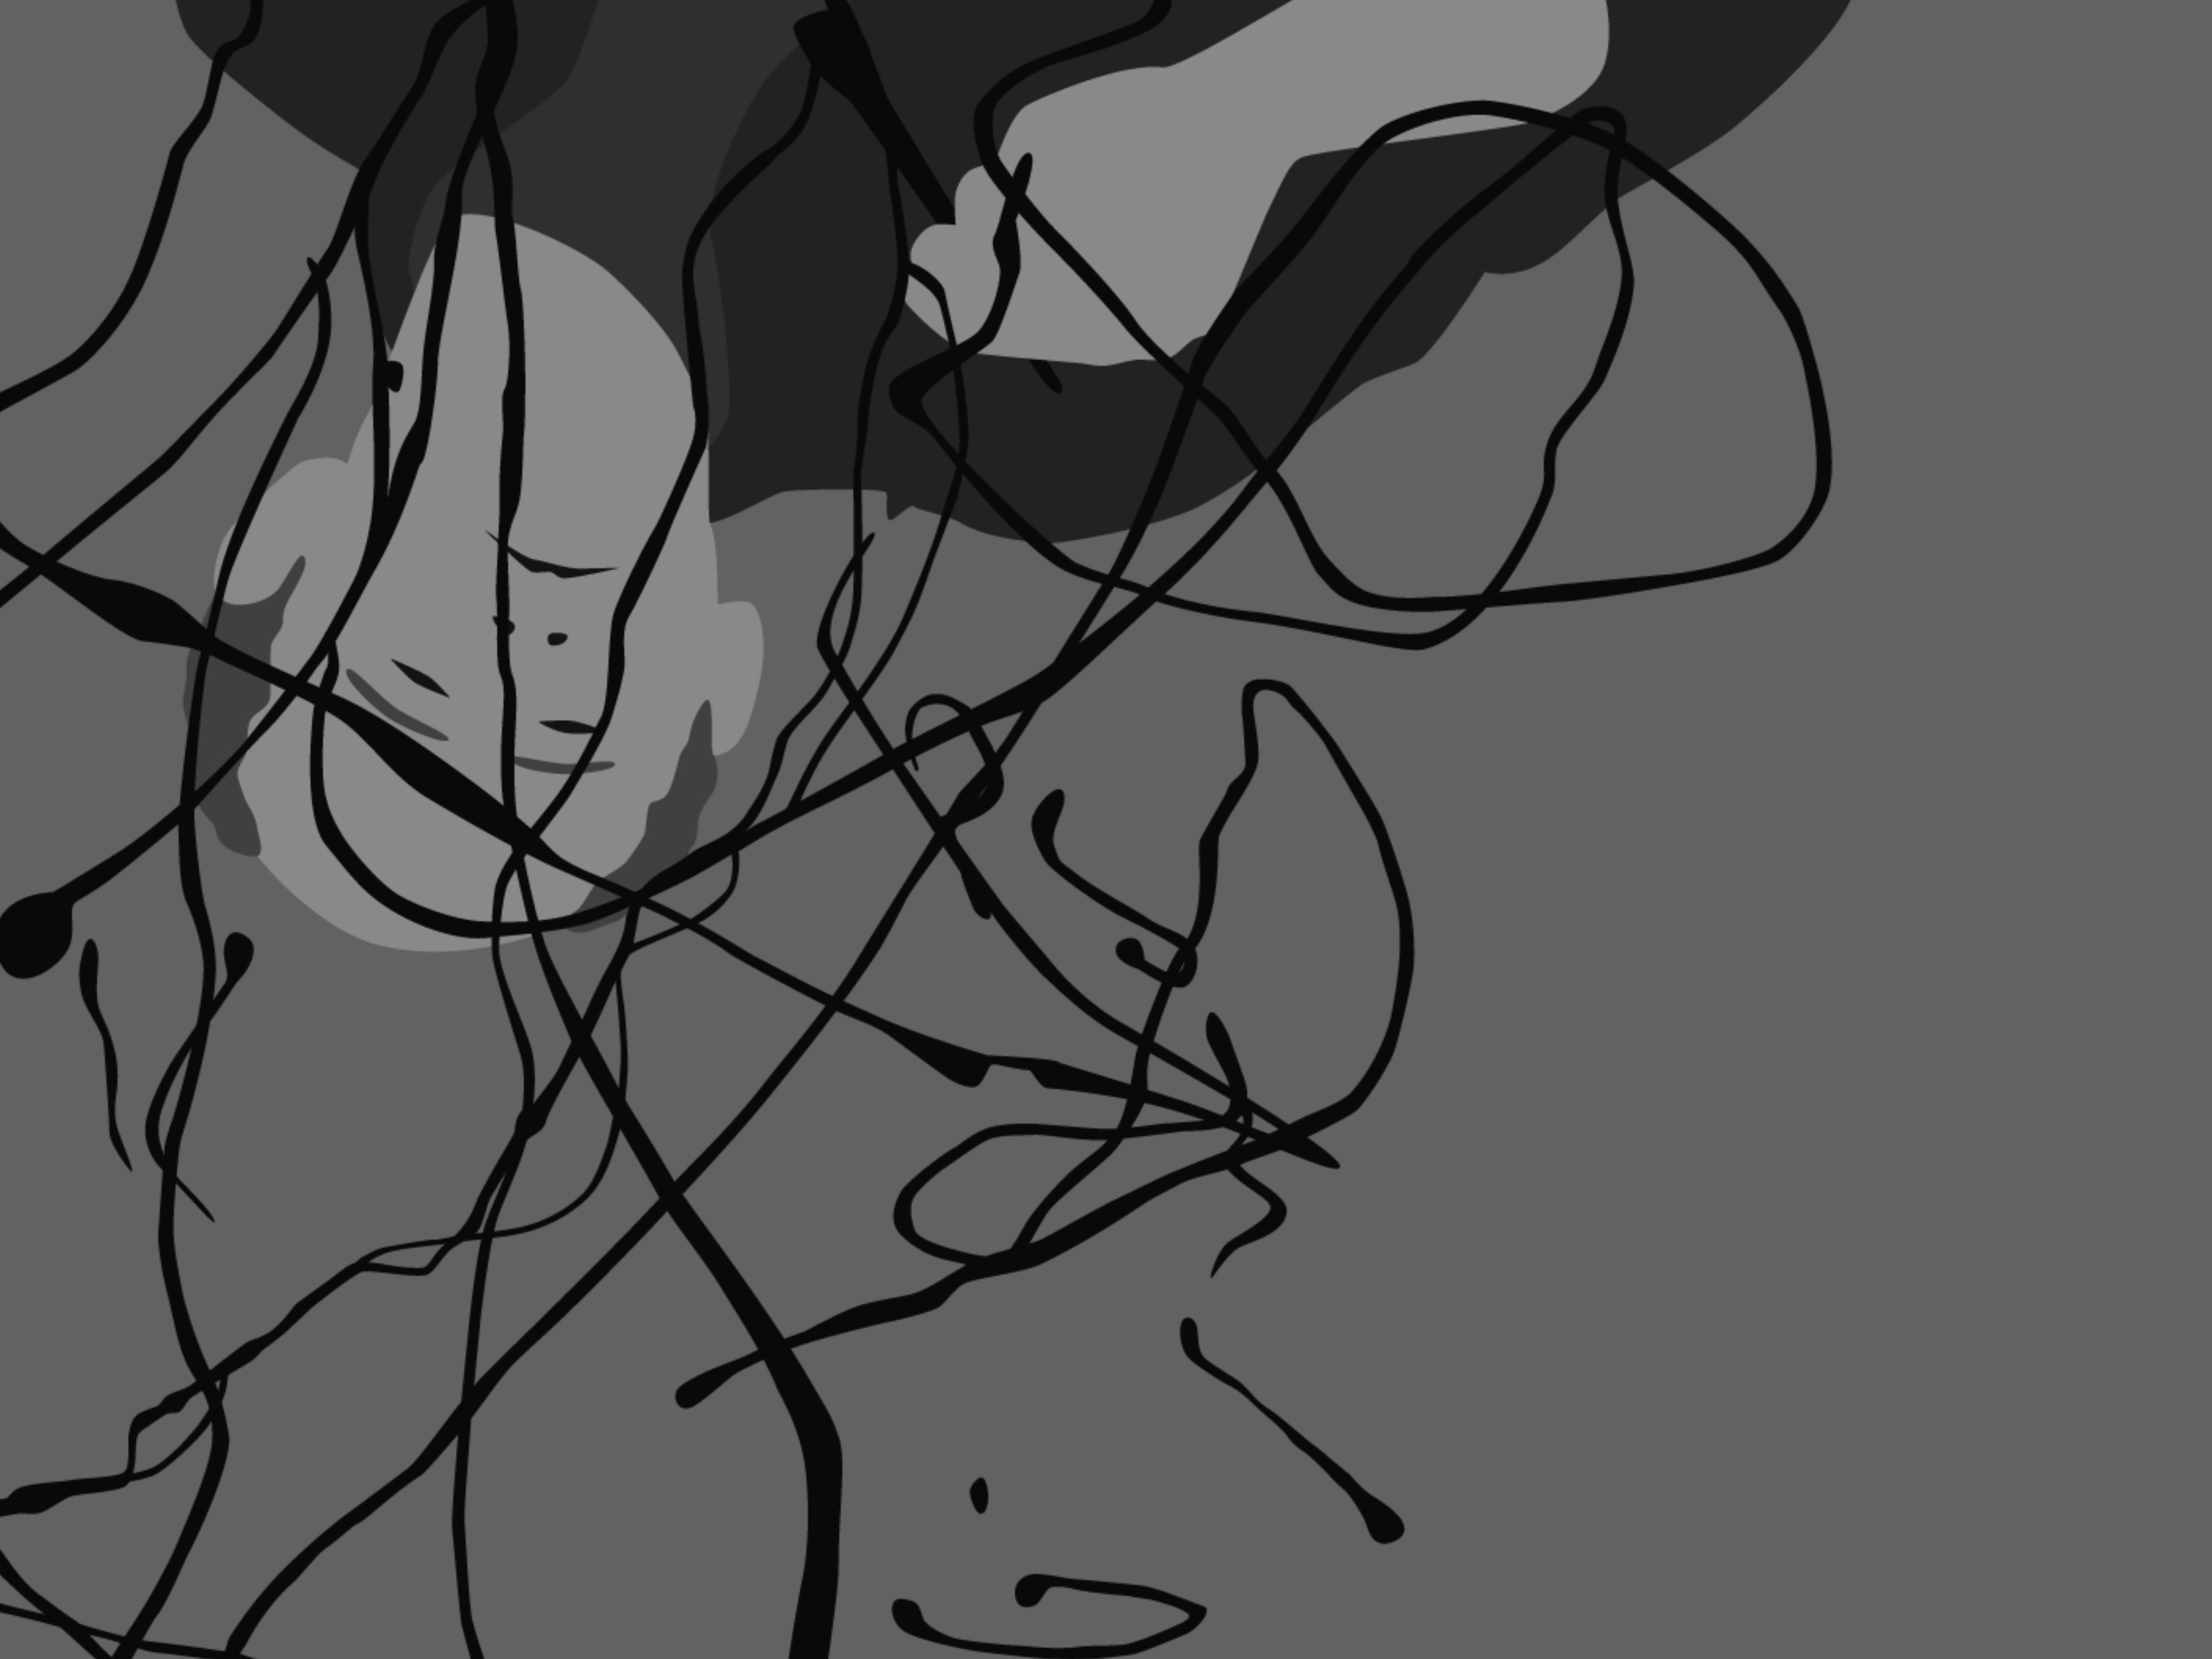 Kota Ezawa, Paint, Unpaint, video still, 2014, single-channel video, black and white, silent 1 min., 34 sec., dimensions variable